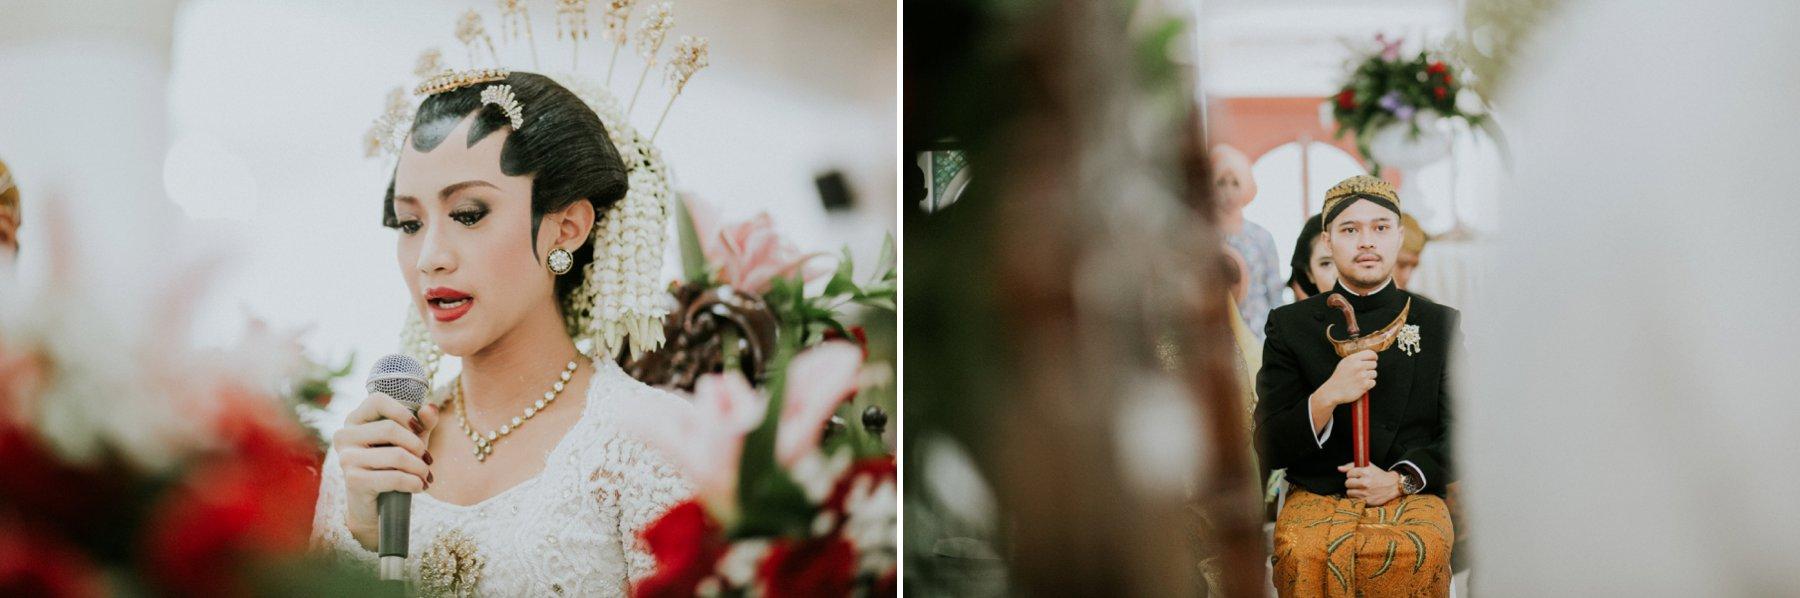 Sampoerna_Strategic_Wedding_Antijitters_Photo_0040